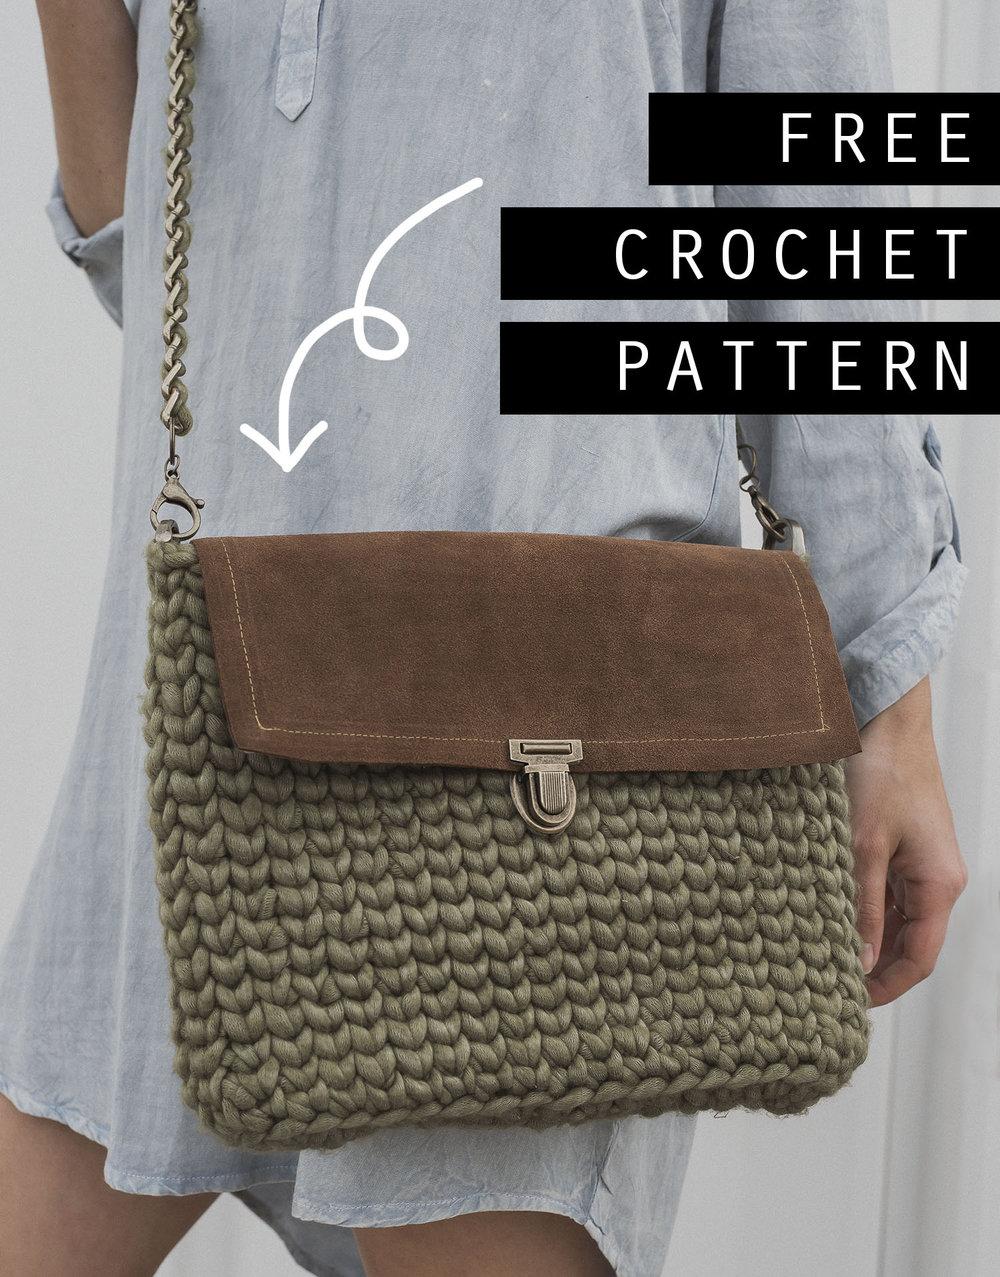 Crochet Pattern Cross Body Bag - Megmade with Love